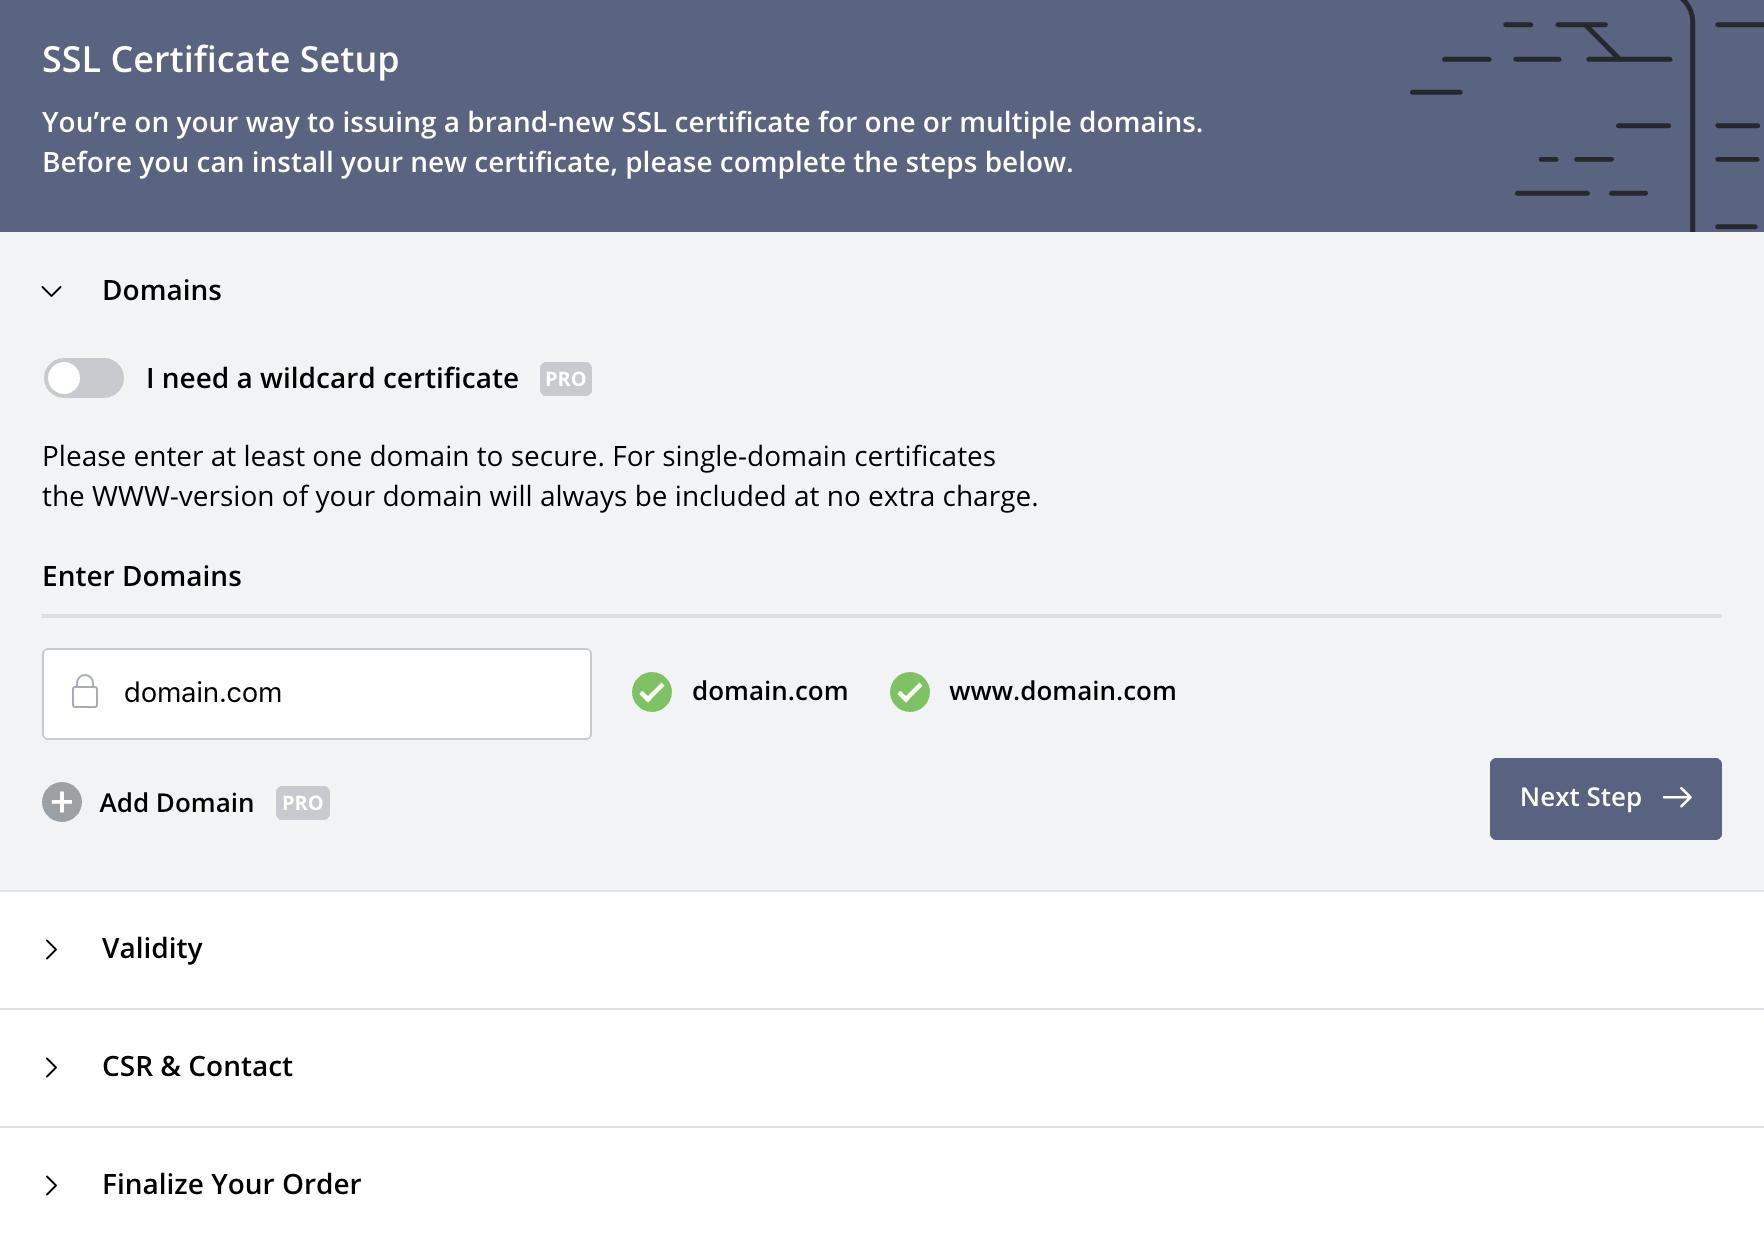 Create Certificate: Domains